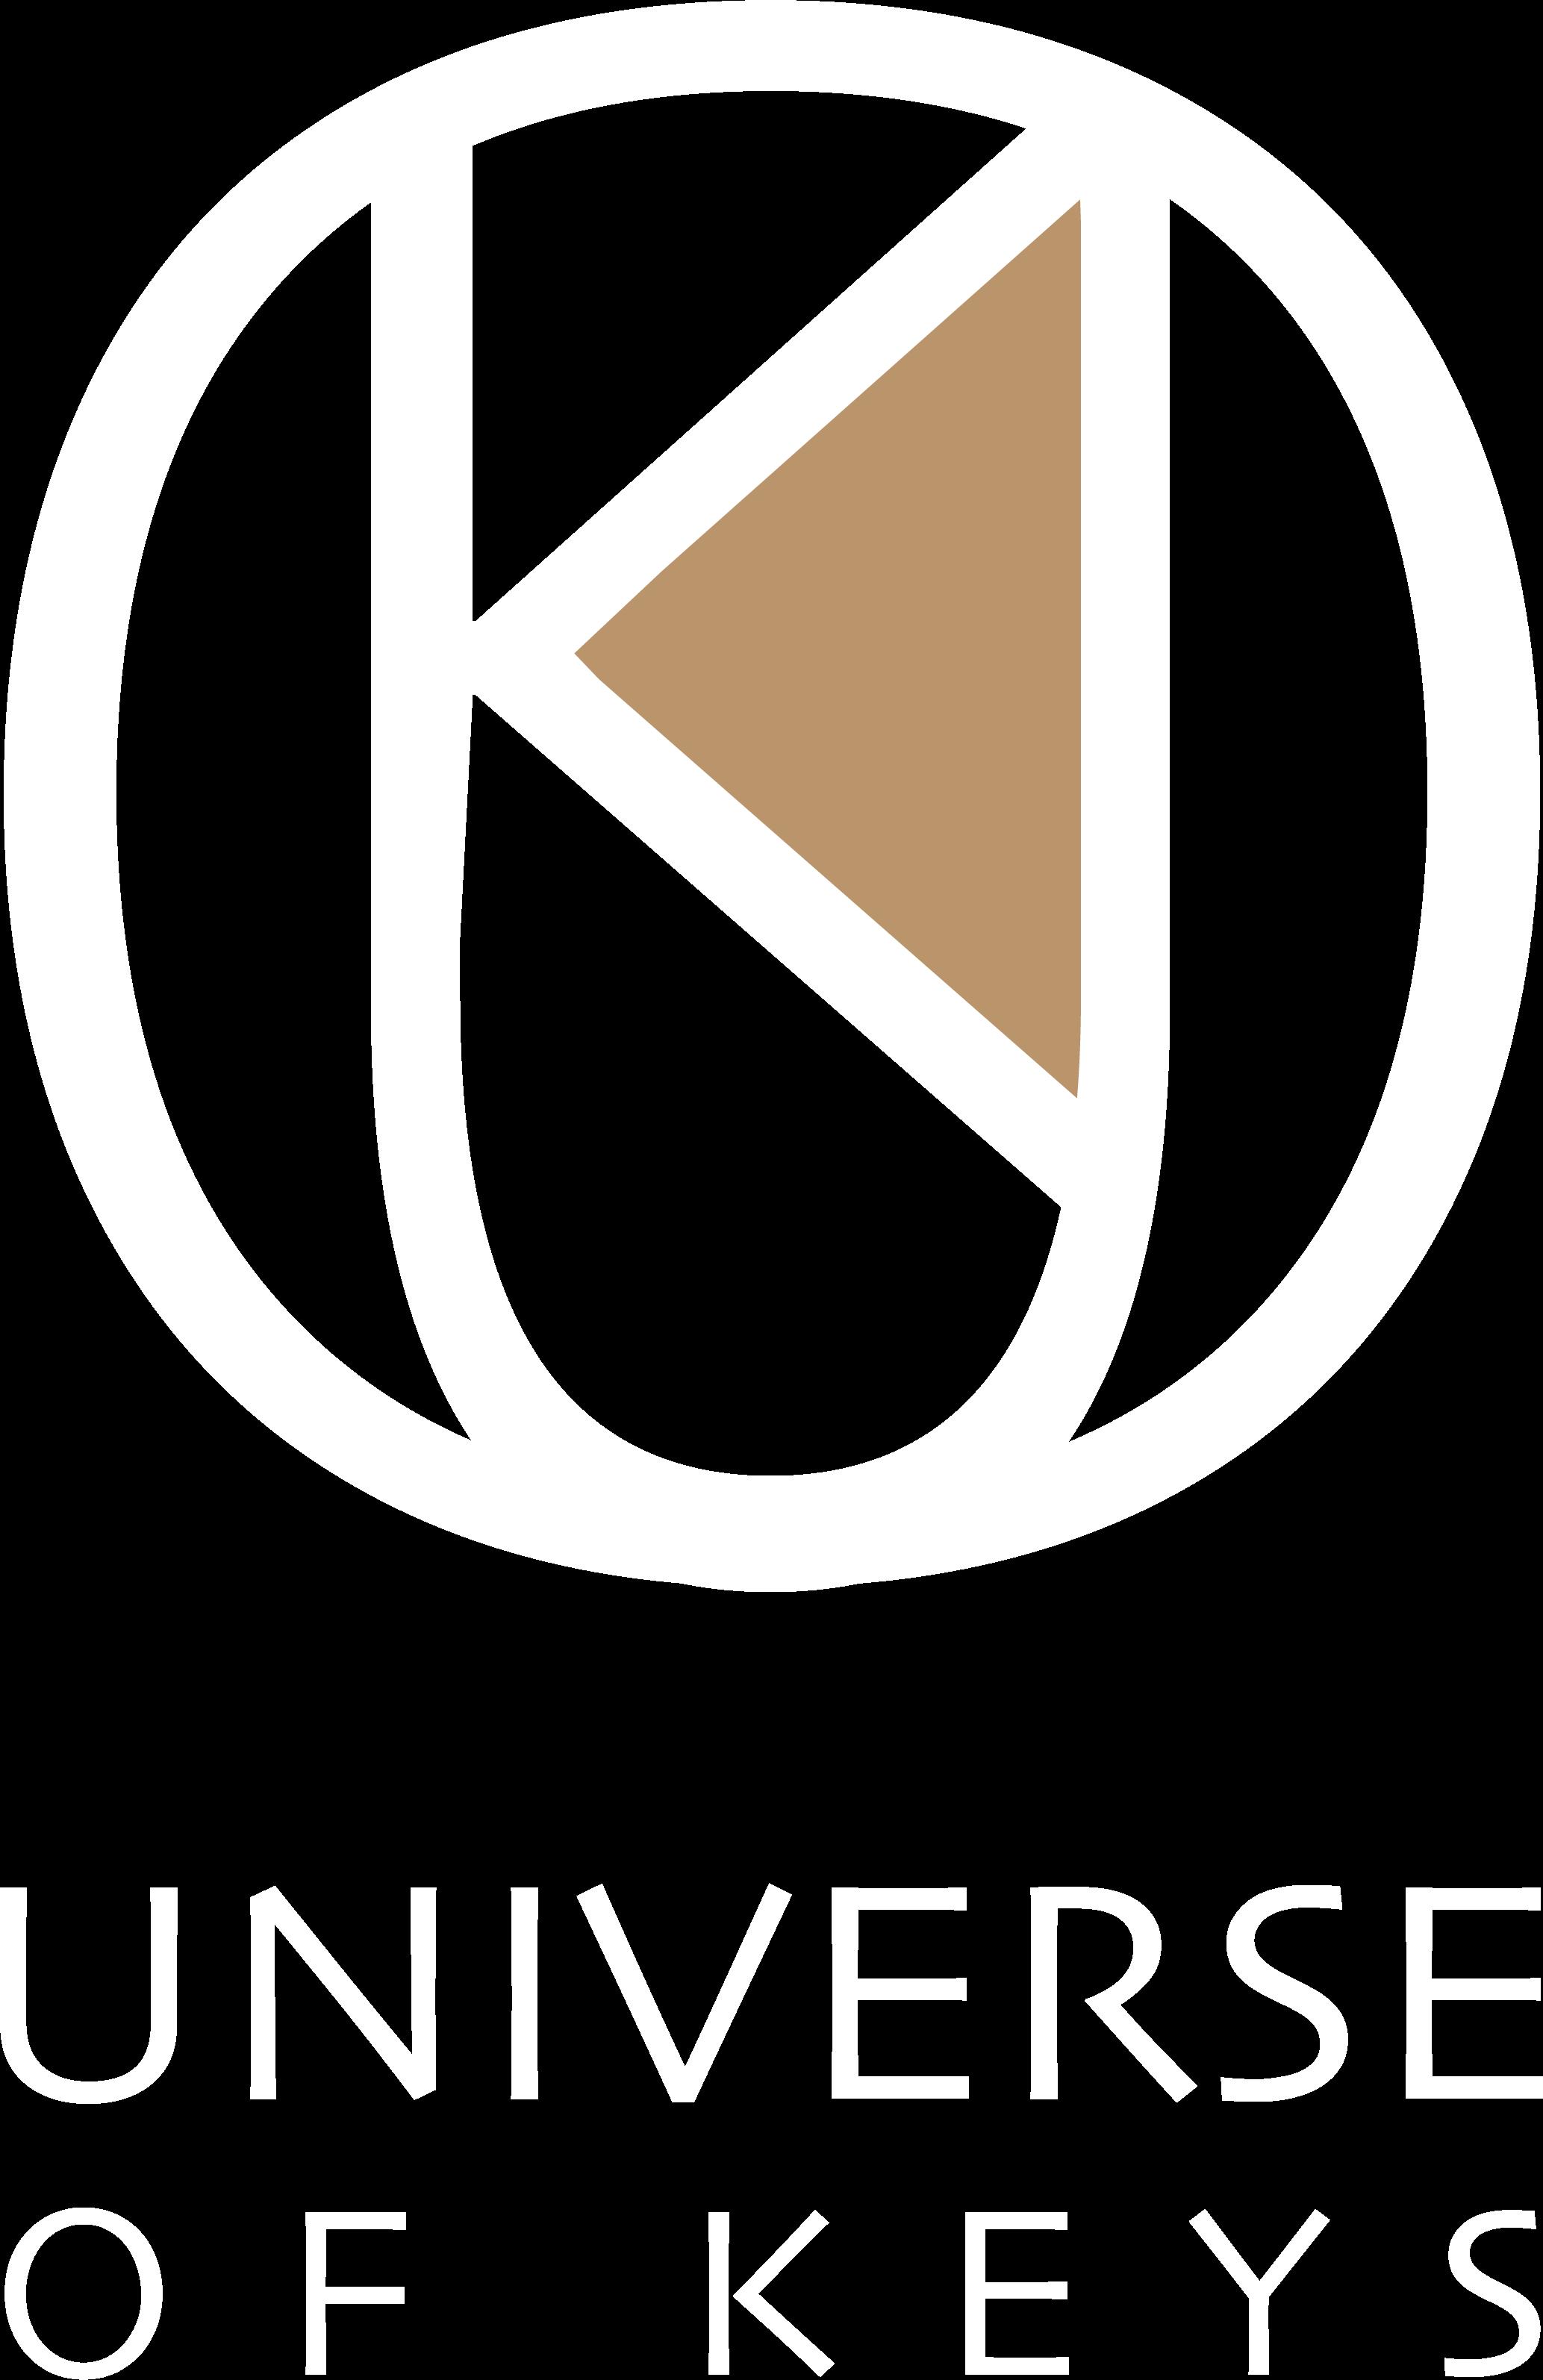 Universe of Keys